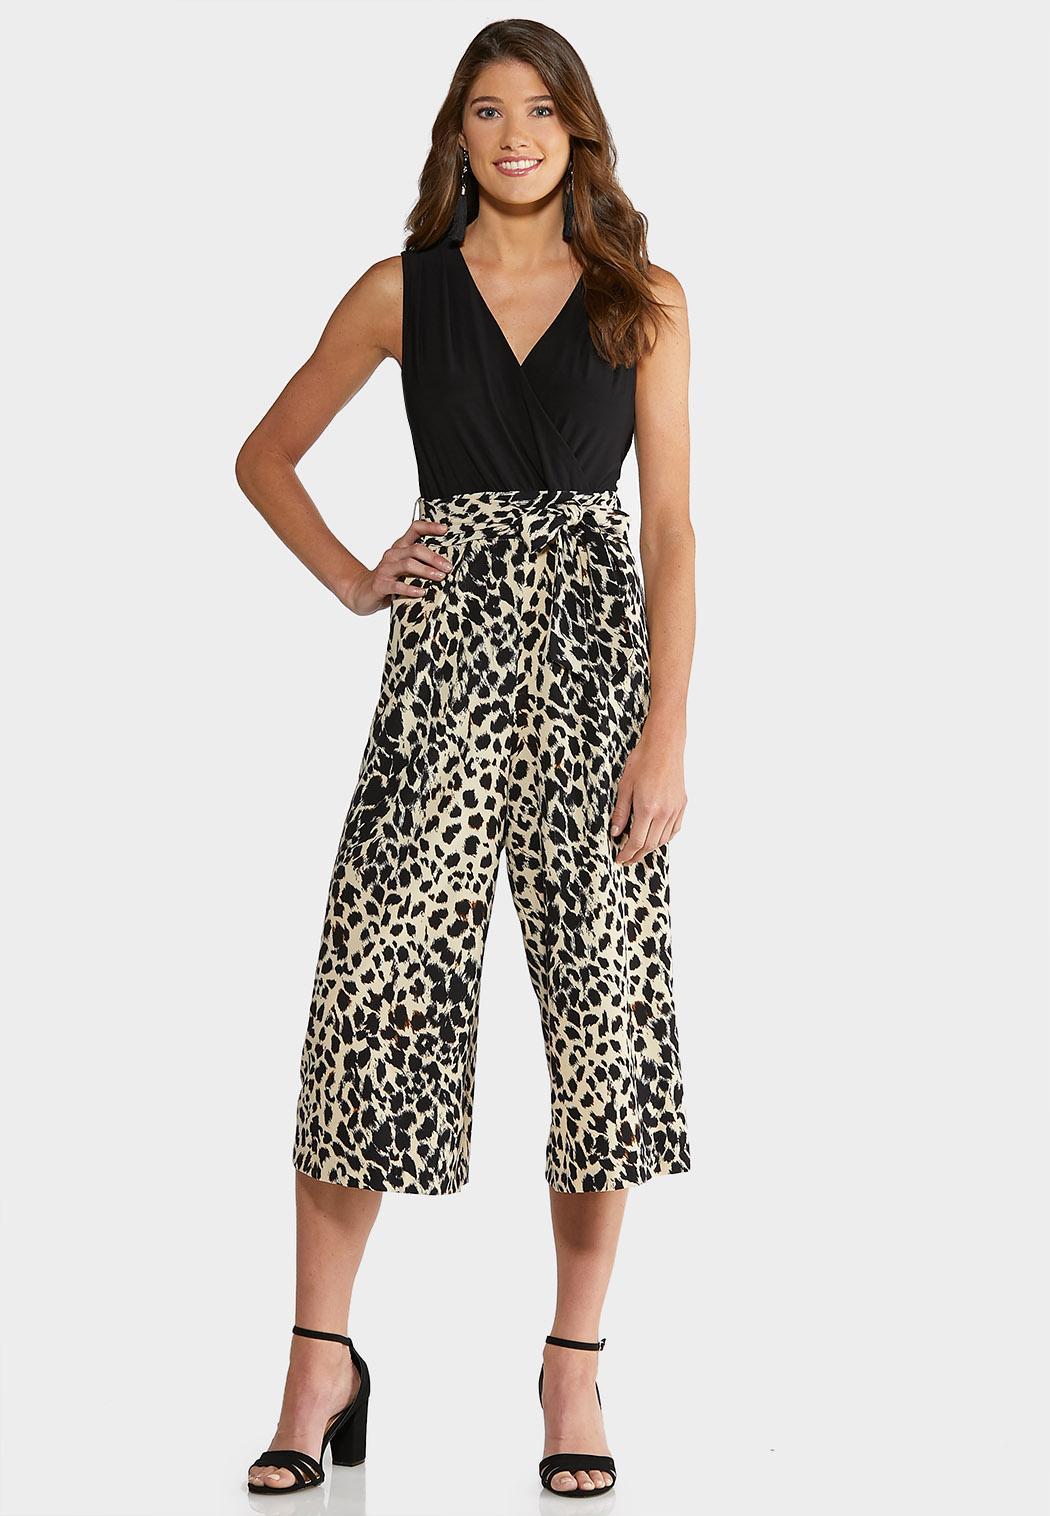 Plus Size Dresses For Women - Swing, Maxi, Midi & More